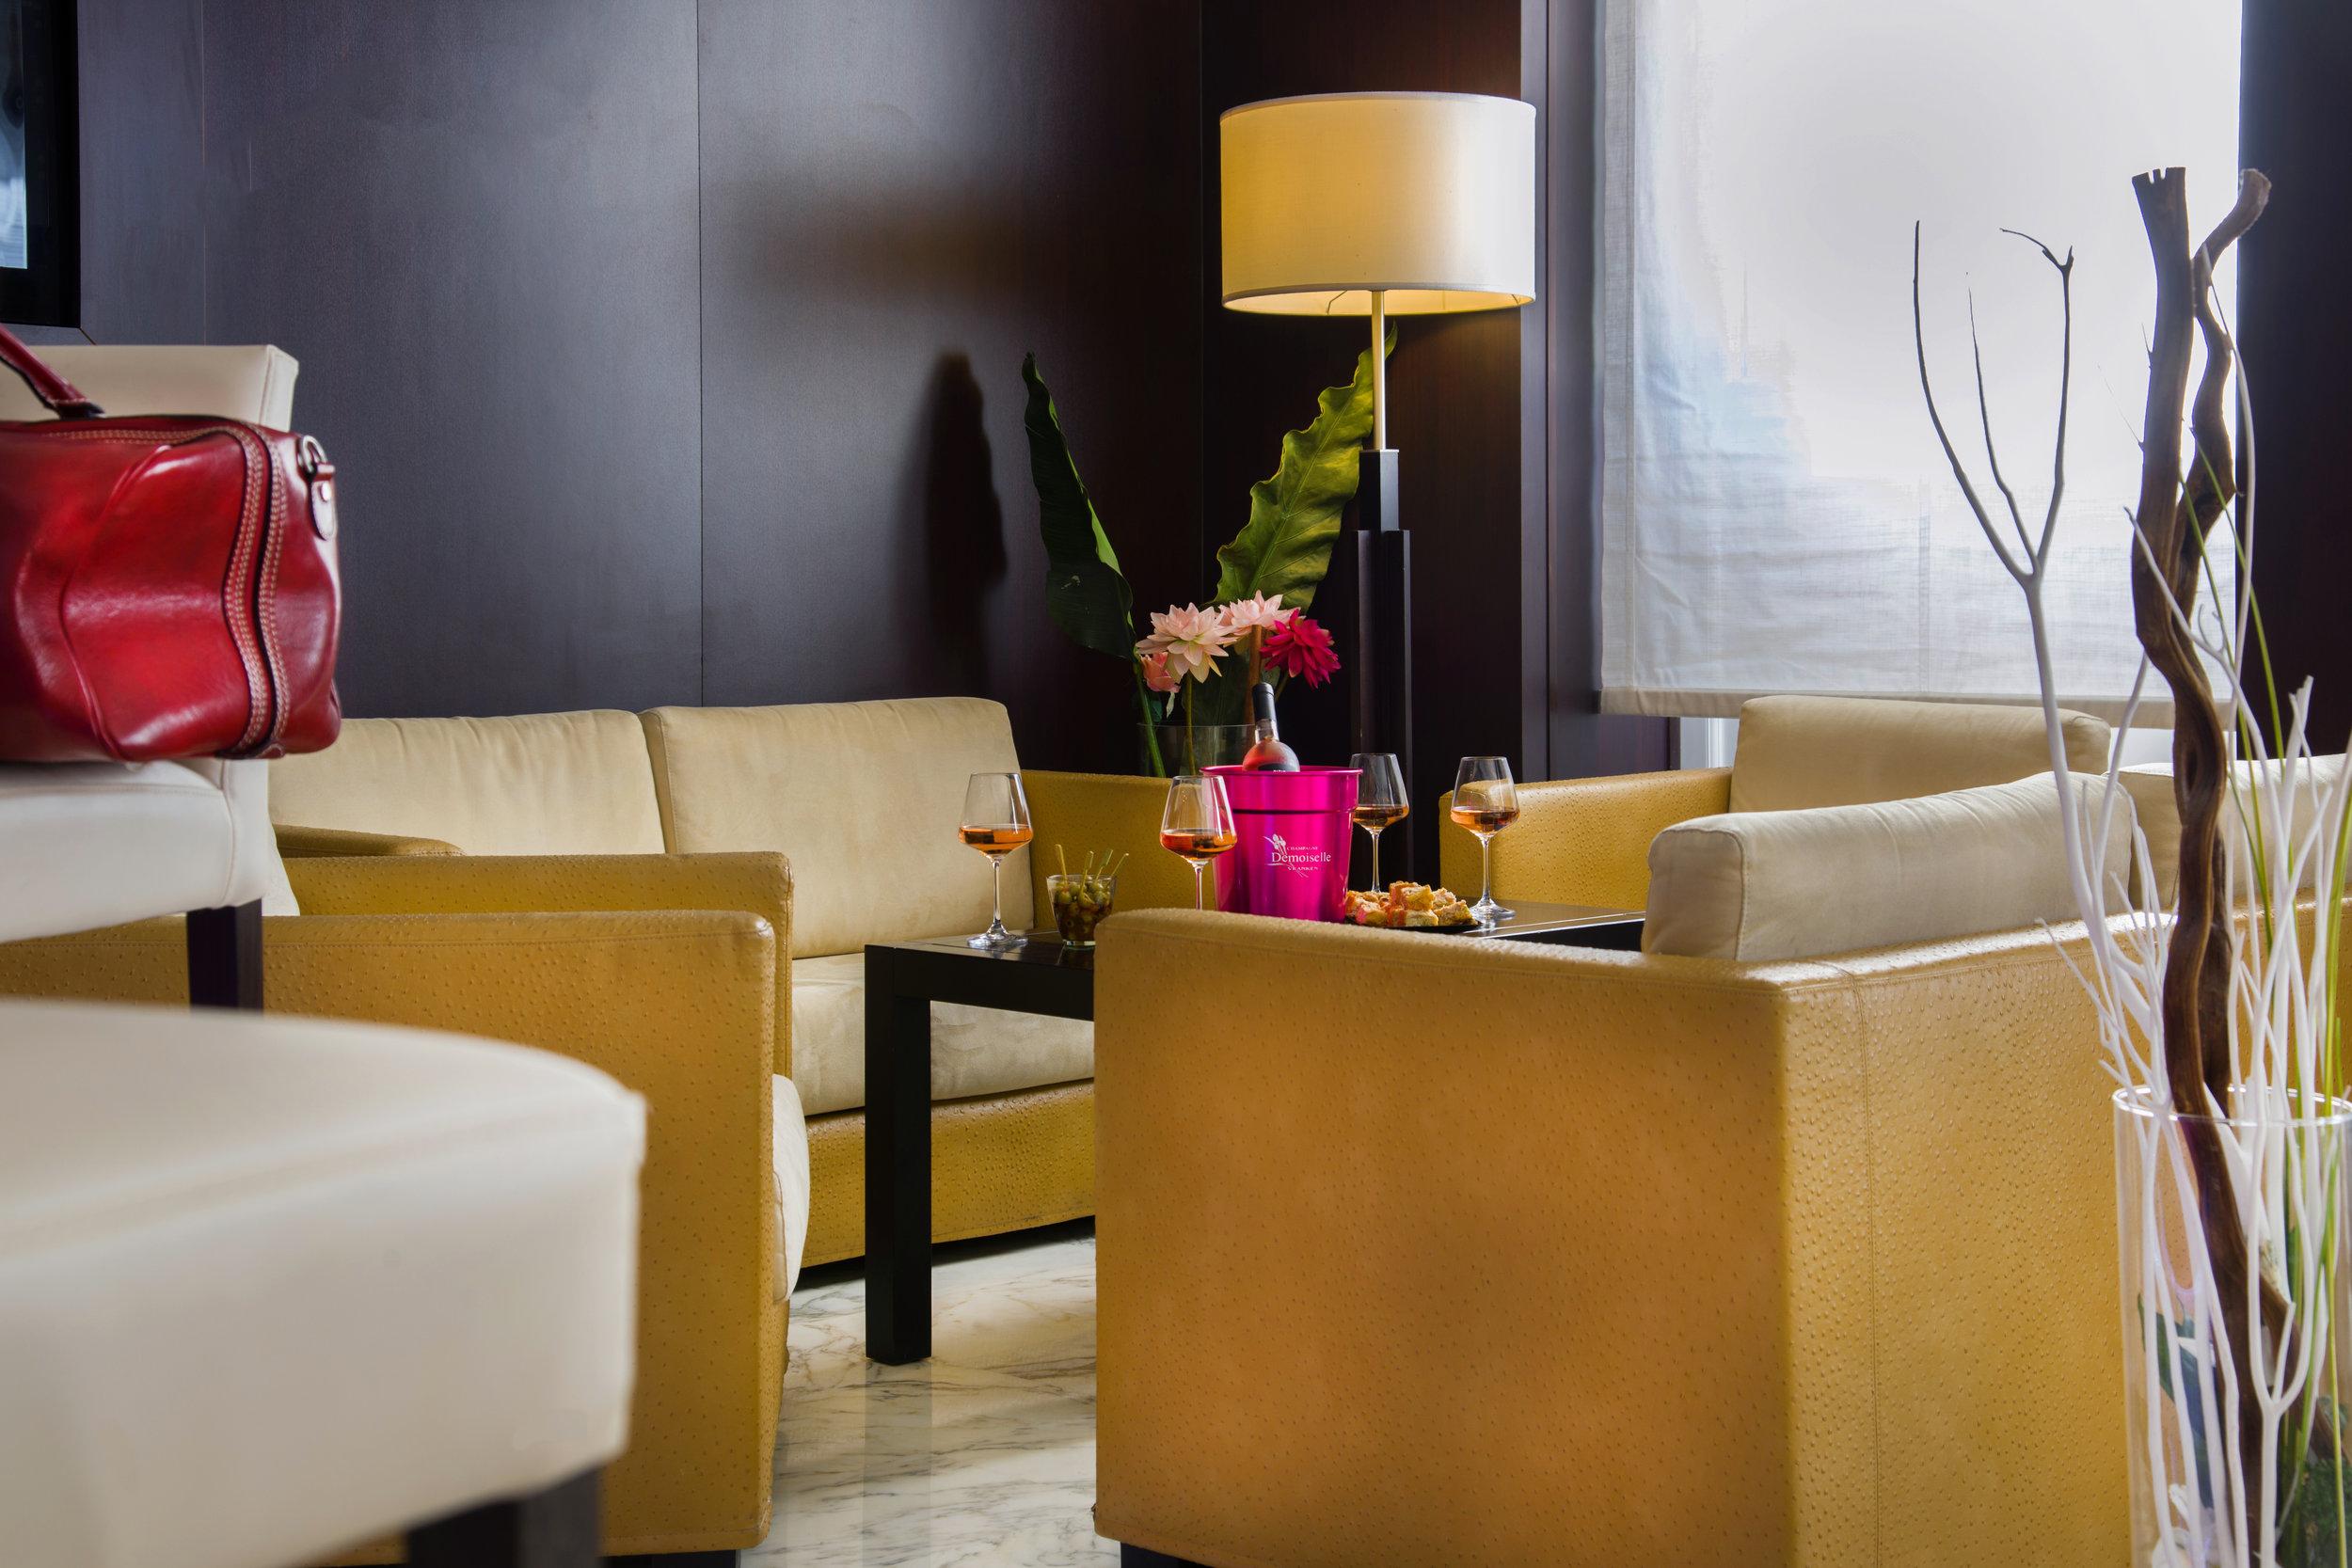 Hotel Lamalmaison Nice 4*